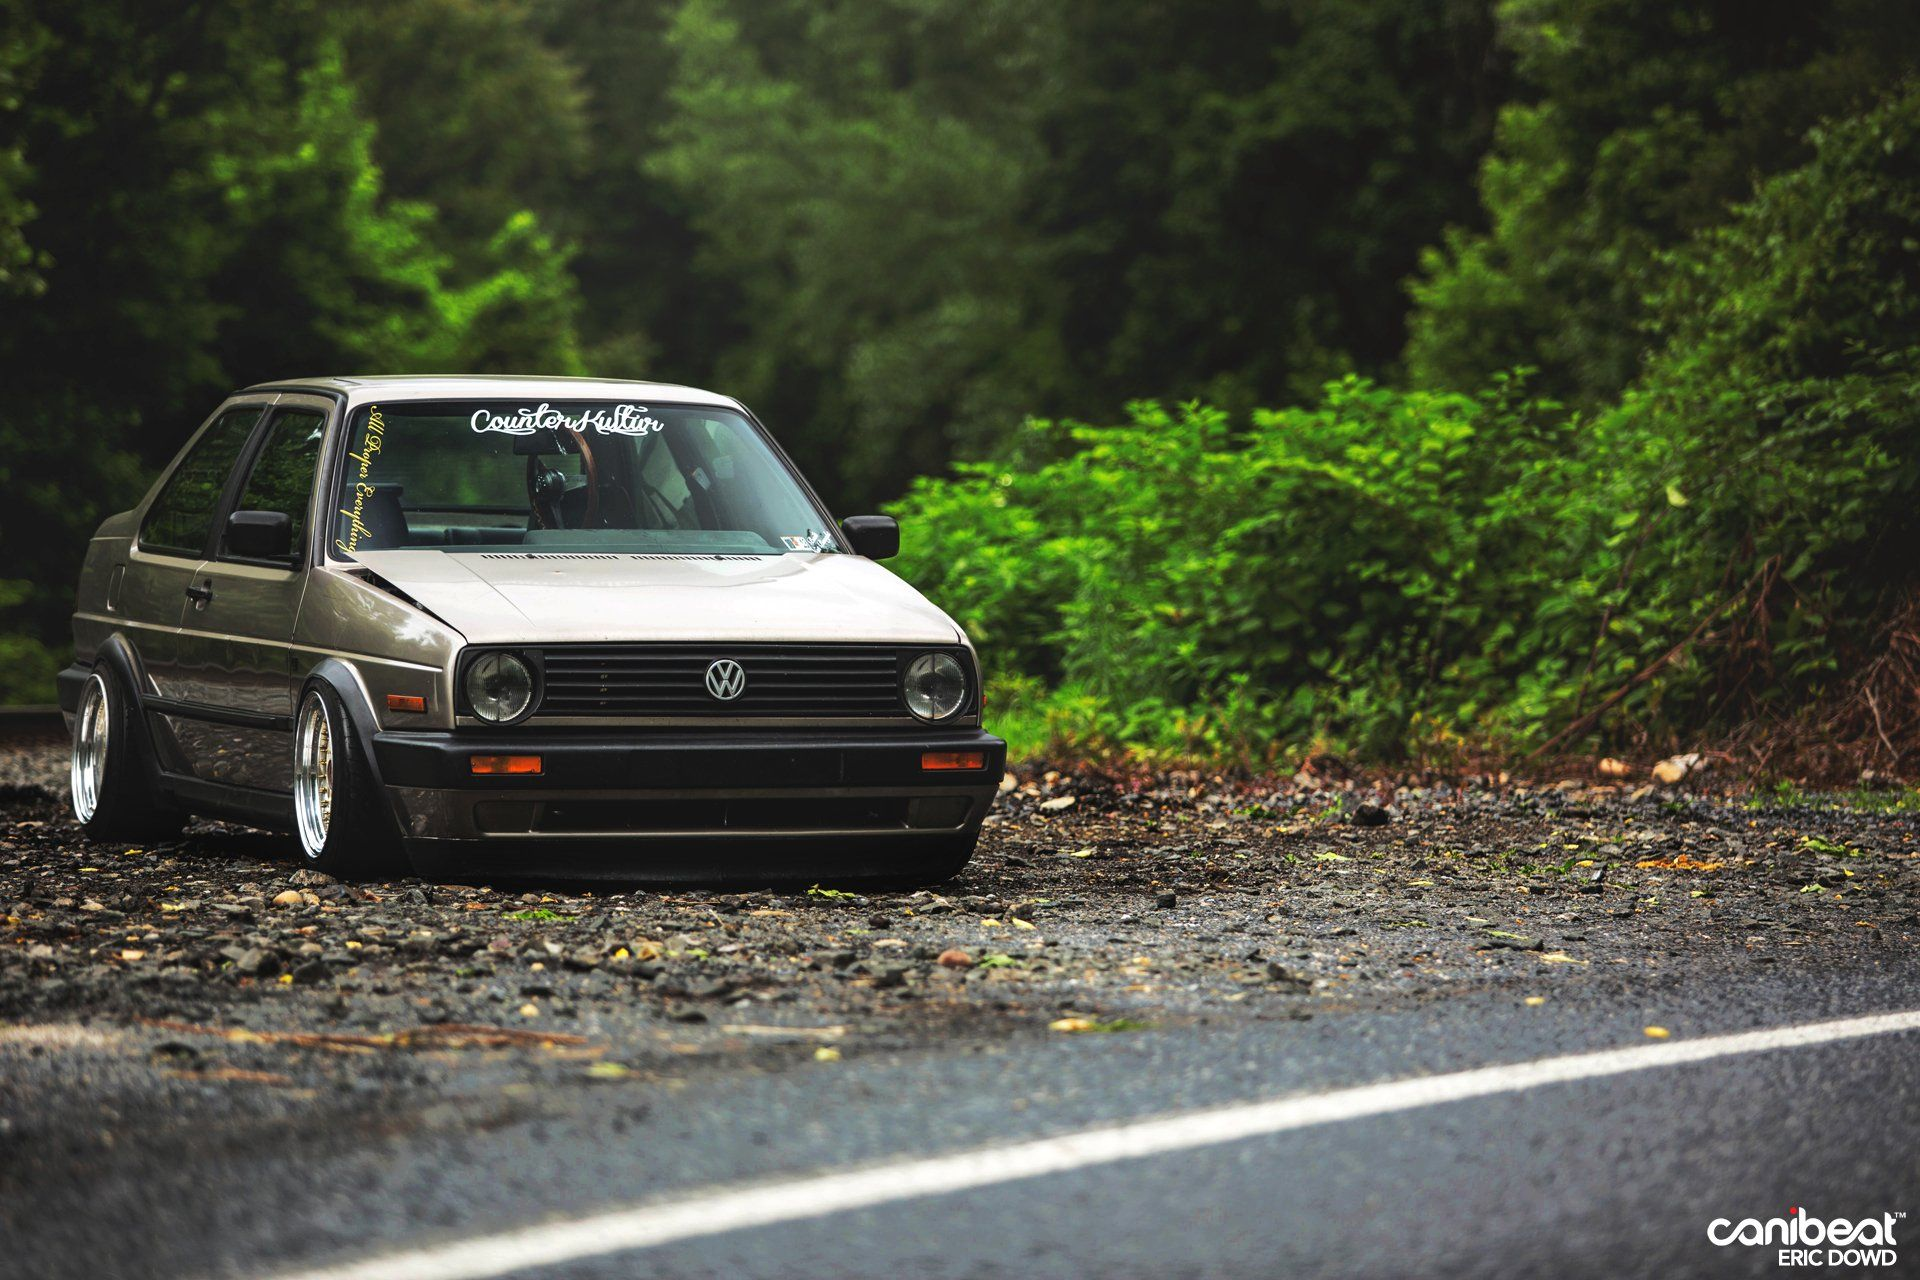 Vw 1 K Golf Car Wallpaper Volkswagen Vw 1 K Golf Wallpapers Vw Golf Volkswagen Polo Gti Volkswagen